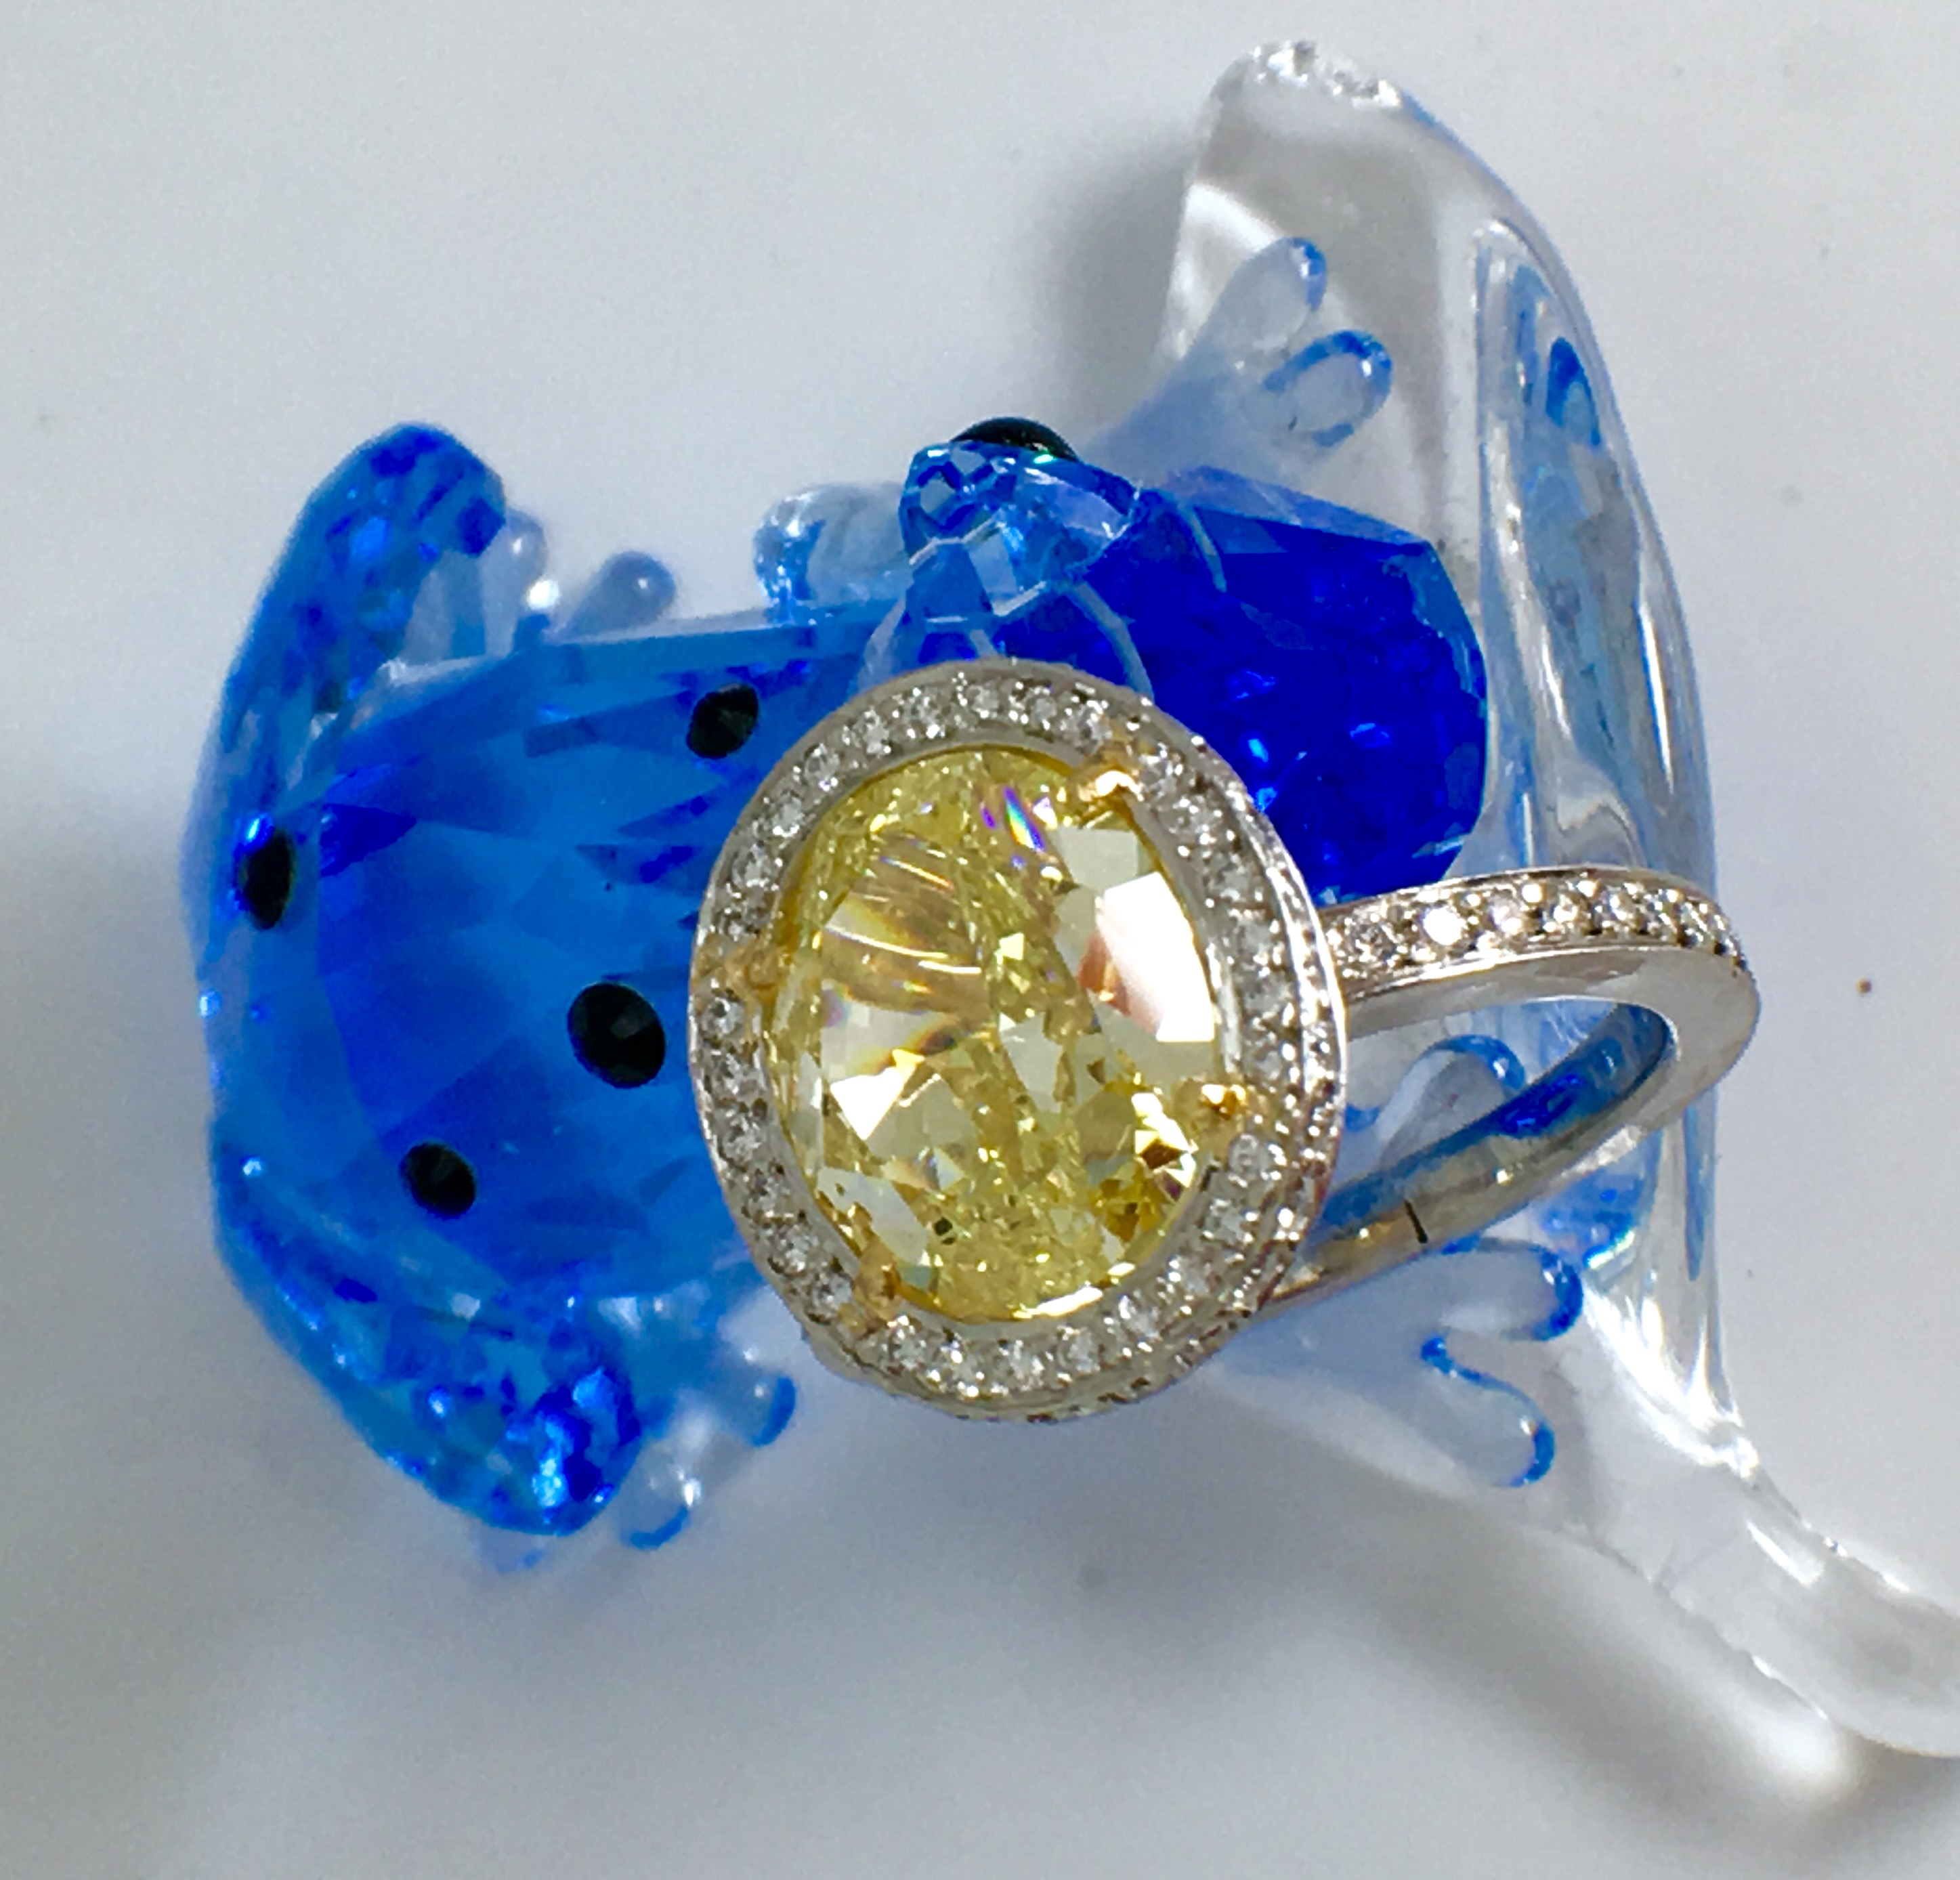 Diamond Creations, Ltd. McLean, VA